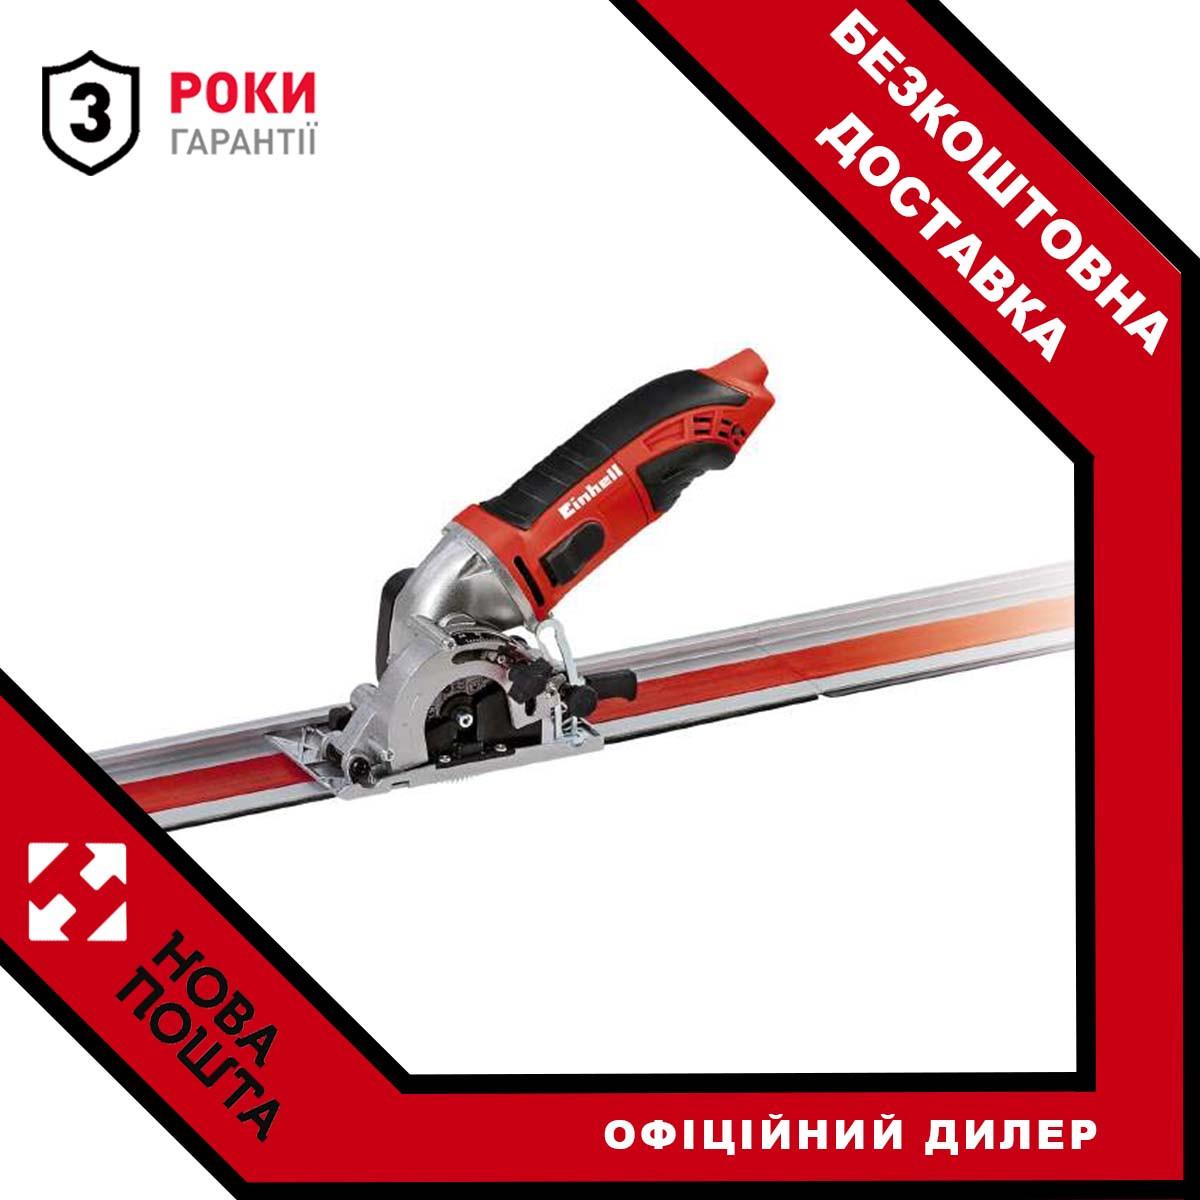 Універсальна Пила Einhell TC-CS 860/1 Kit New